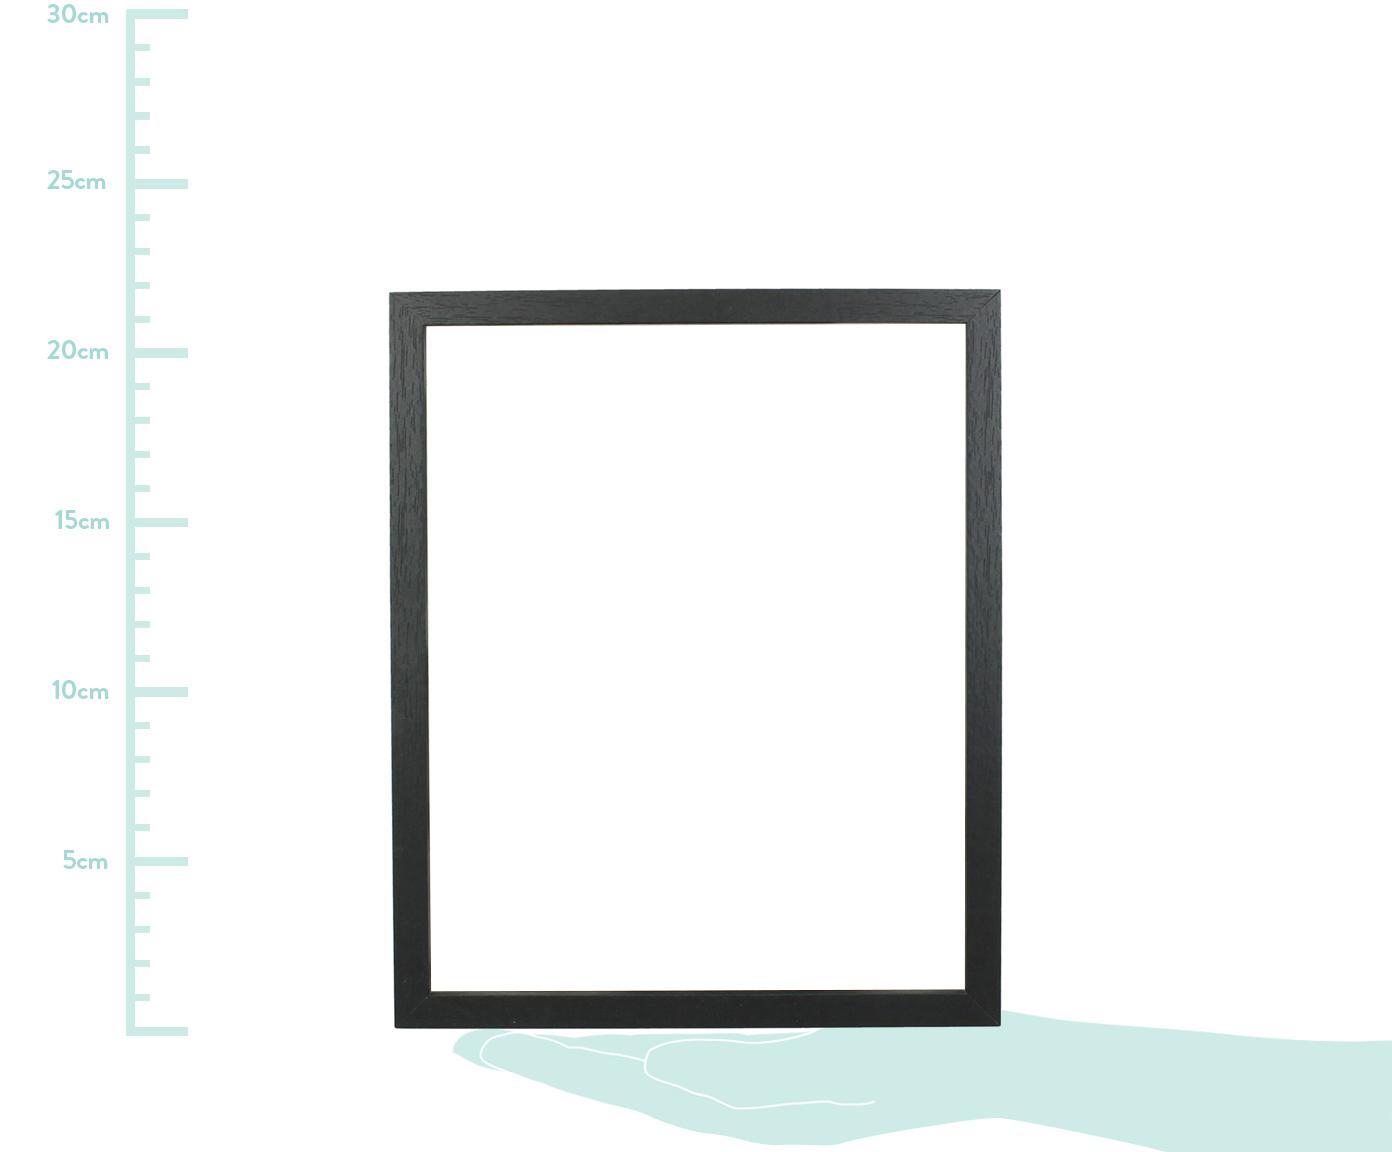 Ramka na zdjęcia Seril, Czarny, 13 x 18 cm